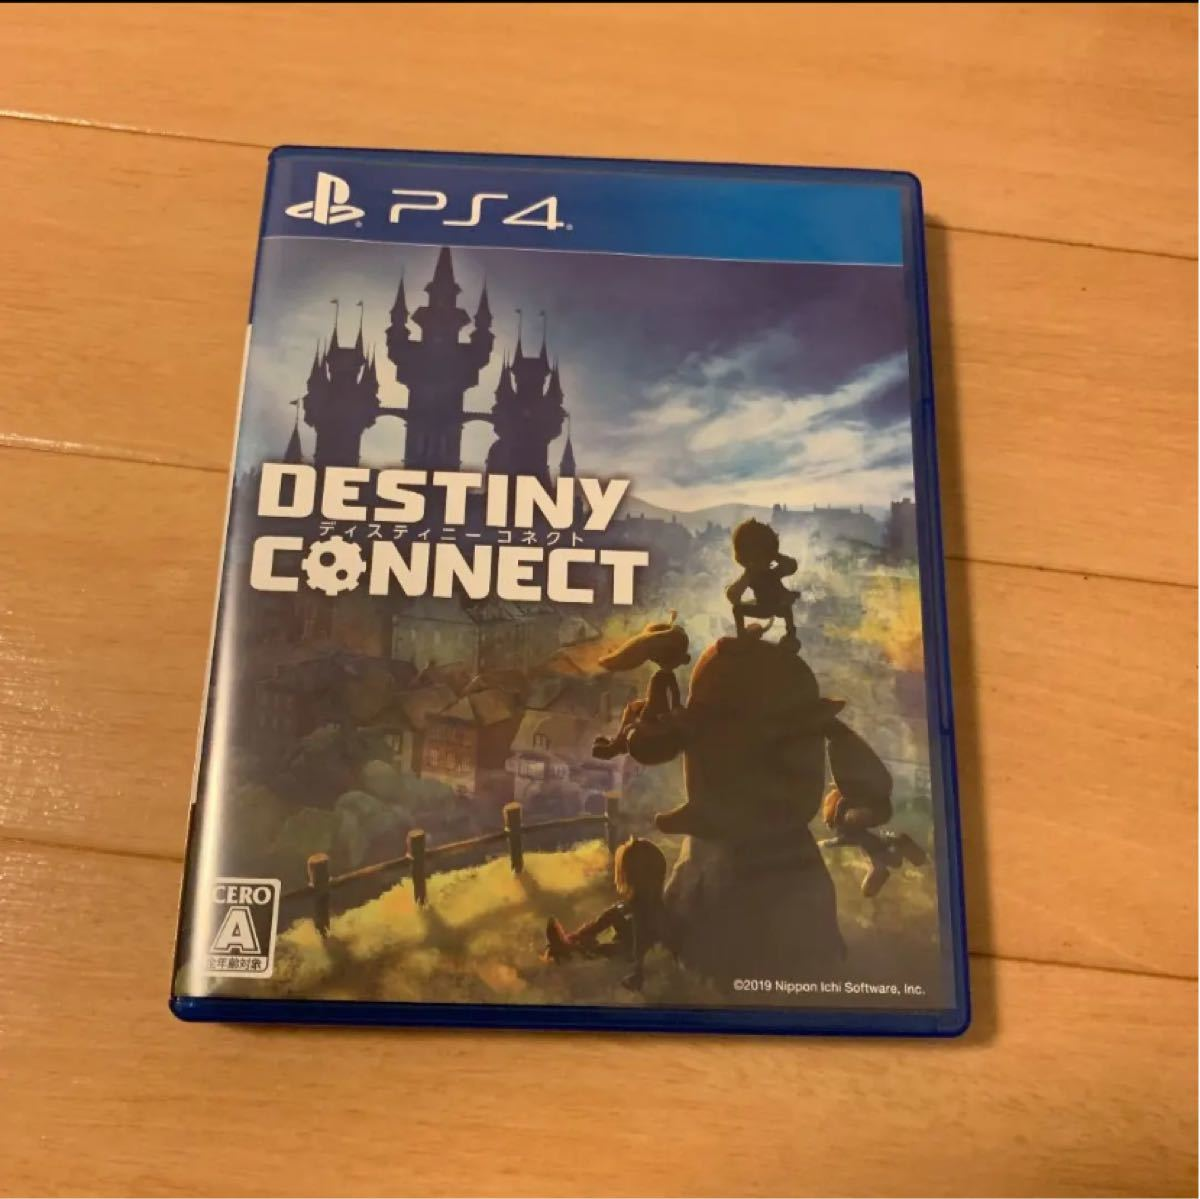 PS4 DESTINY CONNECT ディスティニーコネクト